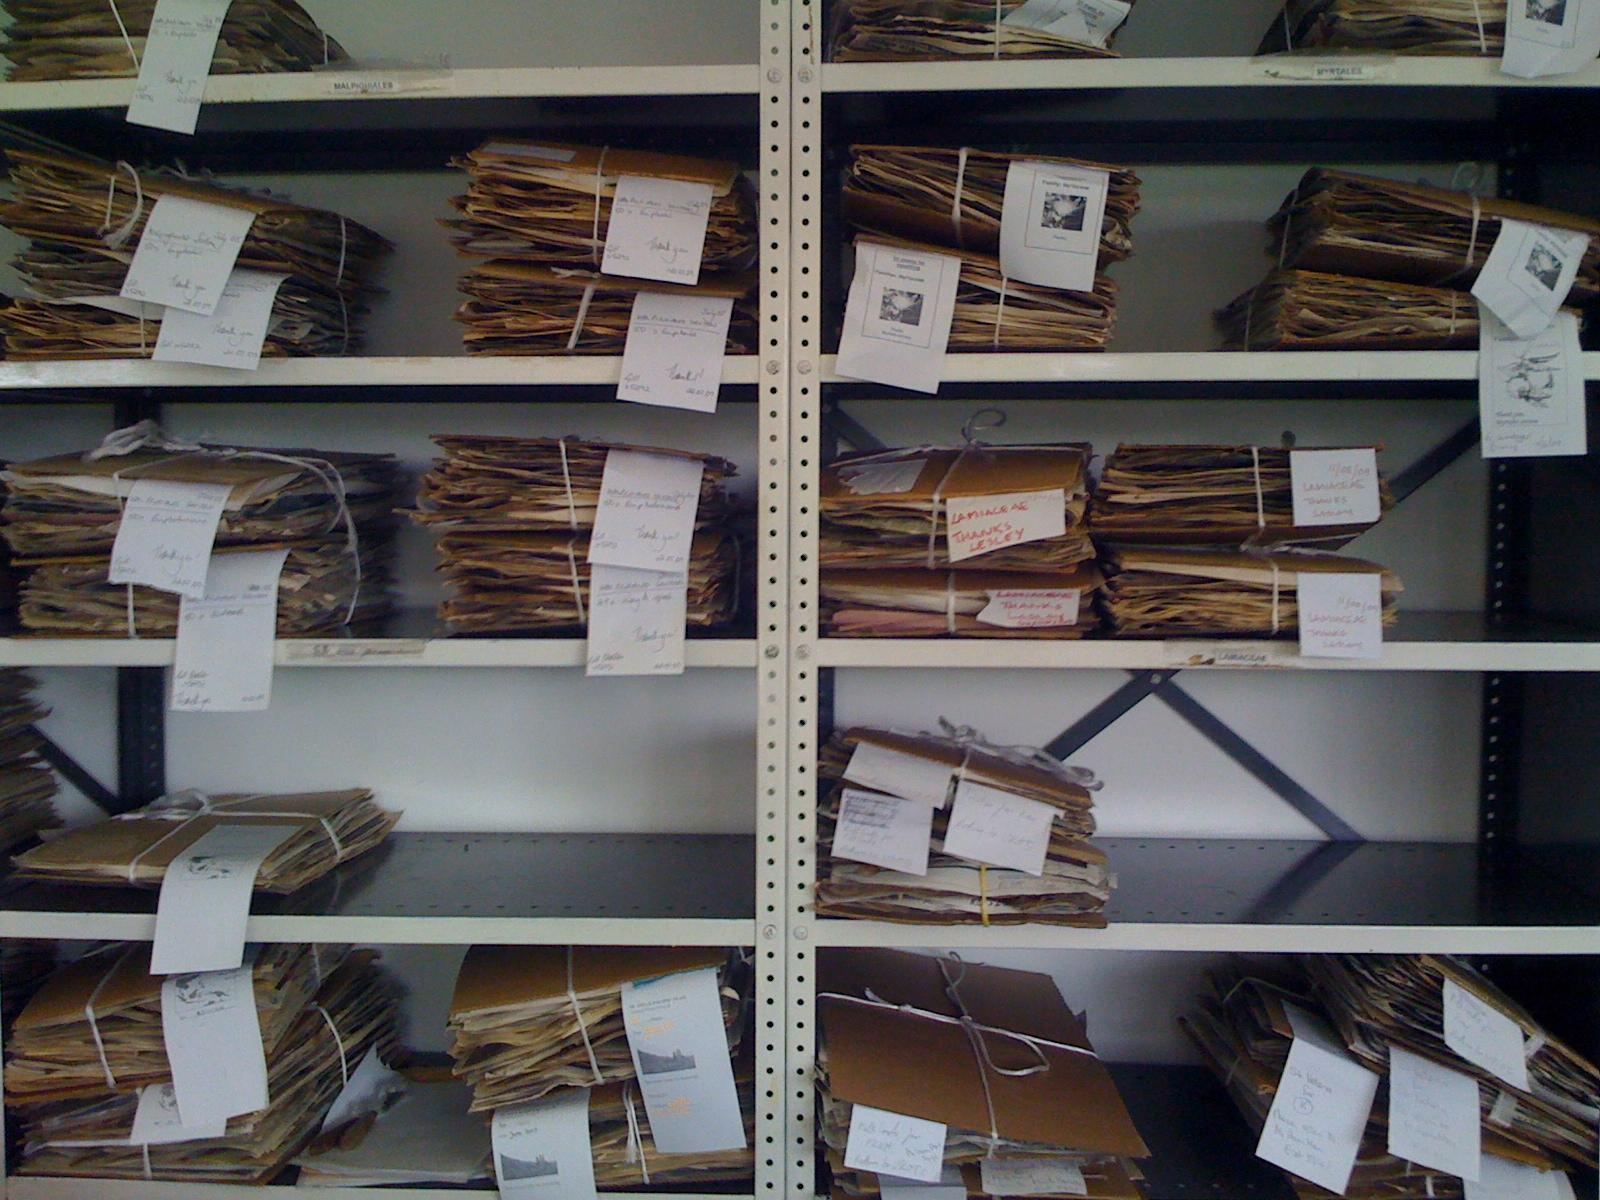 Herbarium - specimens awaiting collection